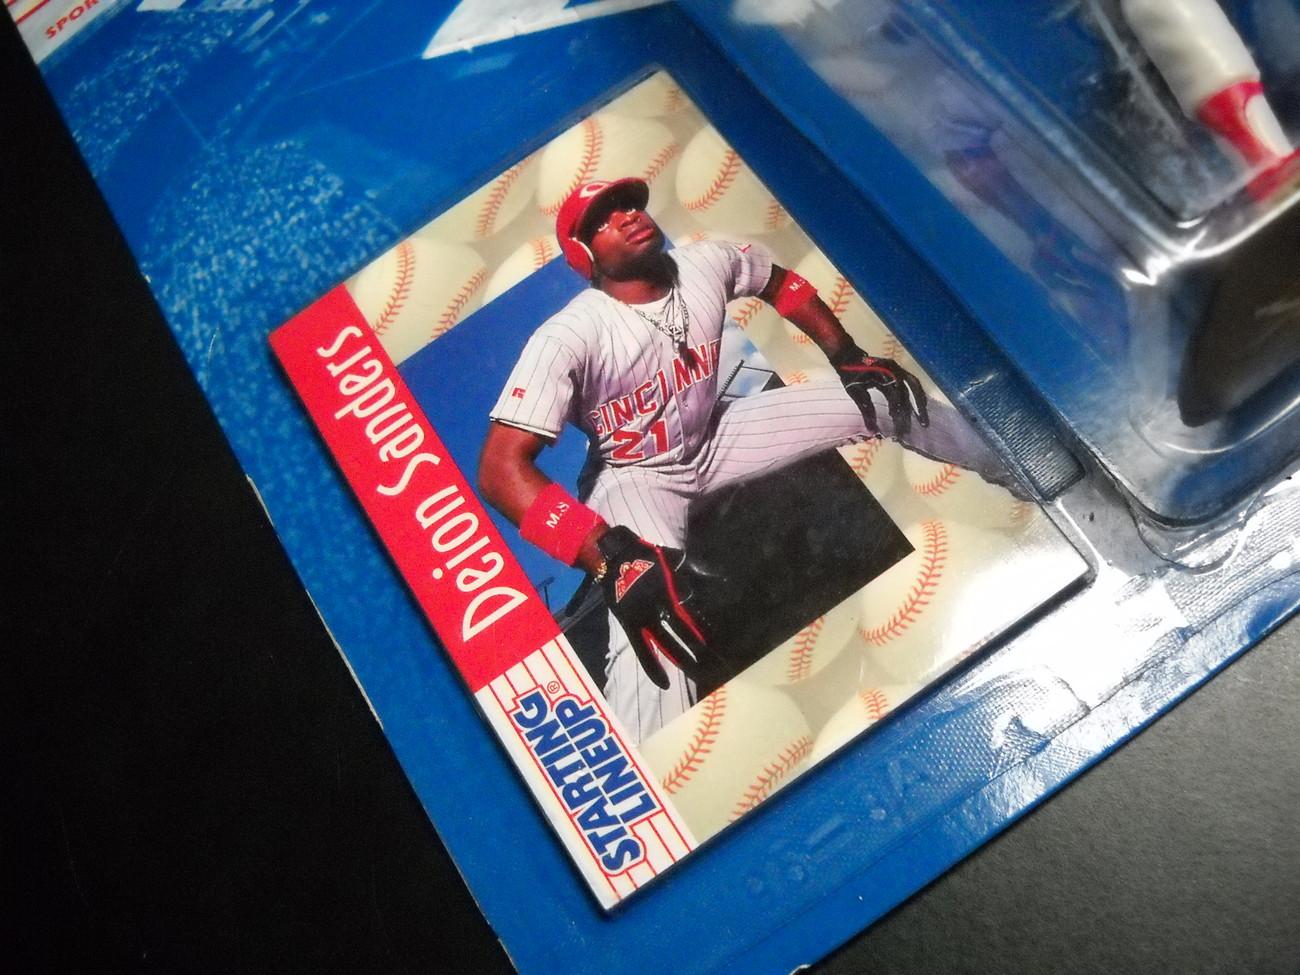 Starting LineUp 1997 10th Edition Deion Sanders Baseball Still Sealed on Card